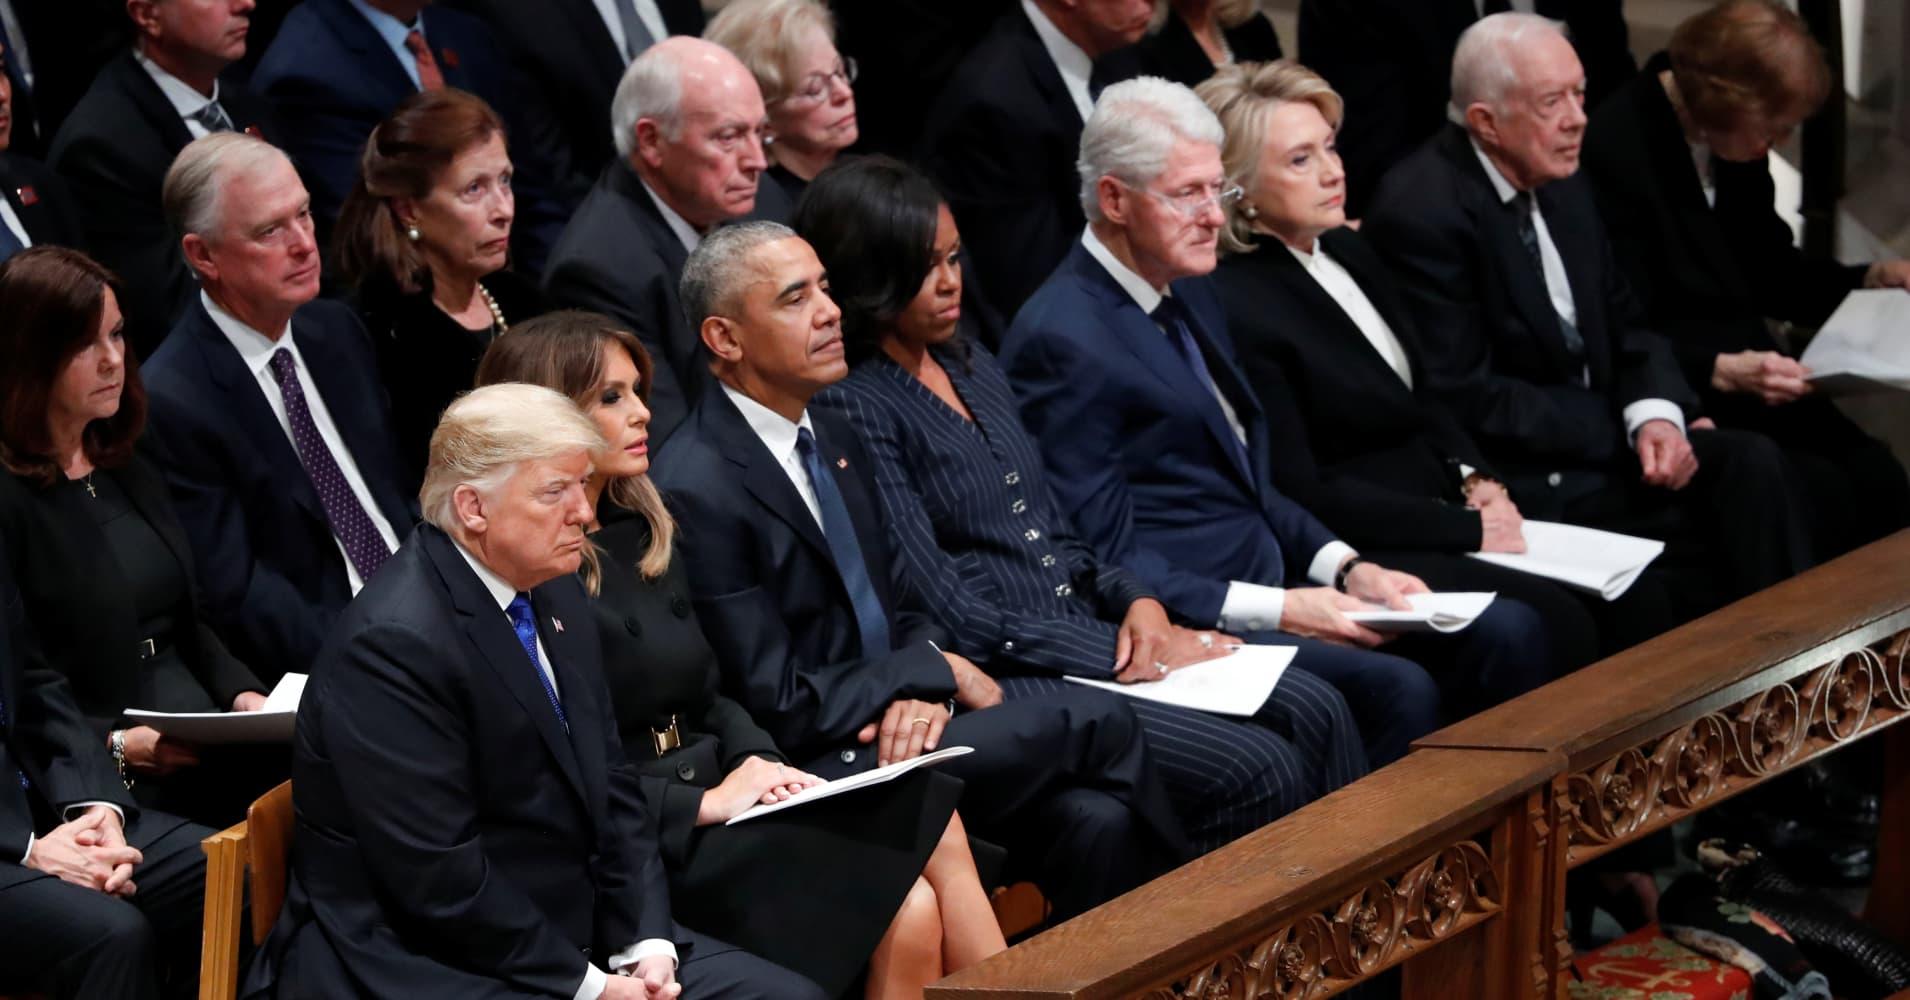 Ceremonies for George HW Bush draw together presidents, world envoys